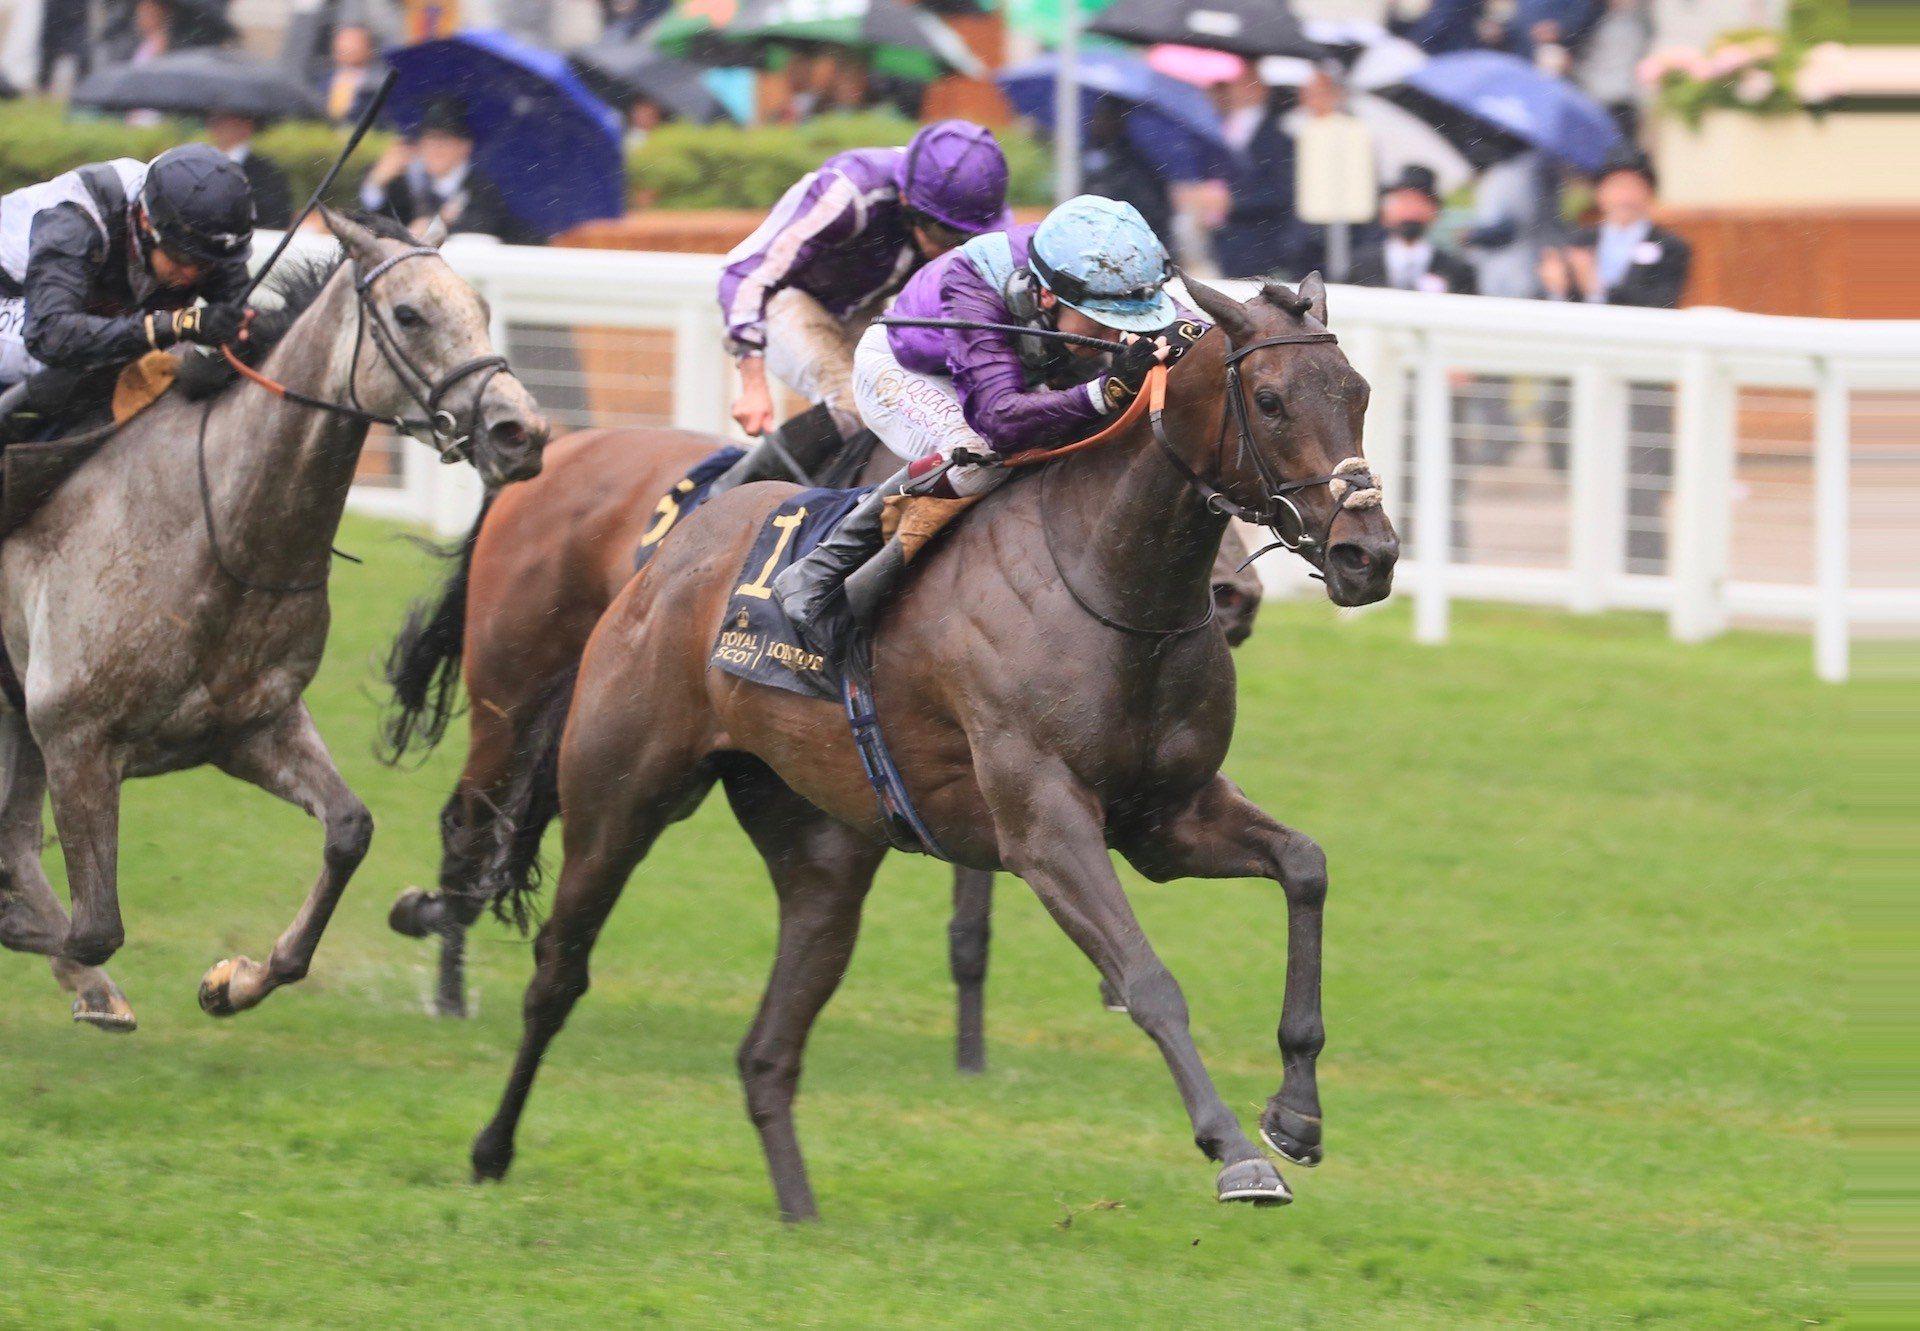 Alcohol Free (No Nay Never) Wins The Group 1 Coronation Stakes at Royal Ascot